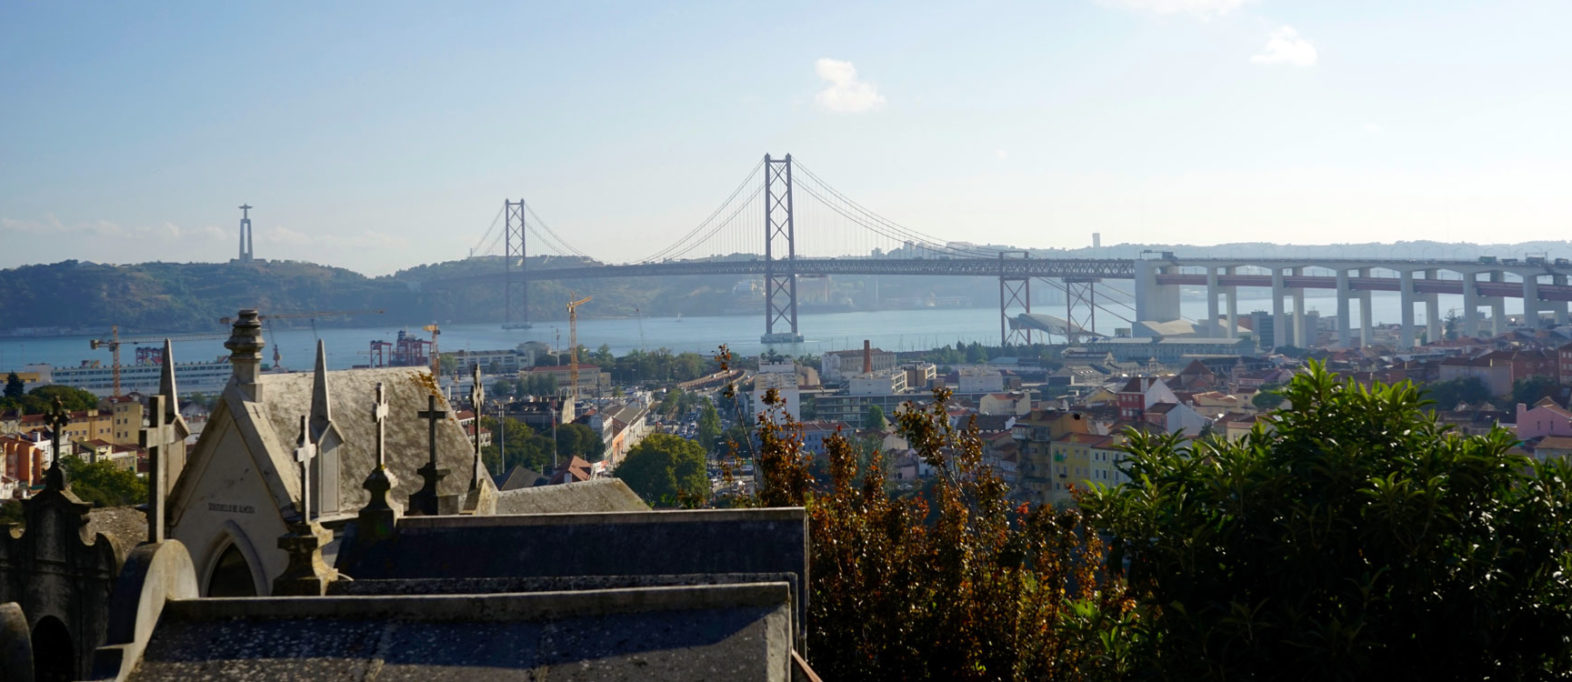 Cemiterio dos Prazeres Geheimtipp Lissabon